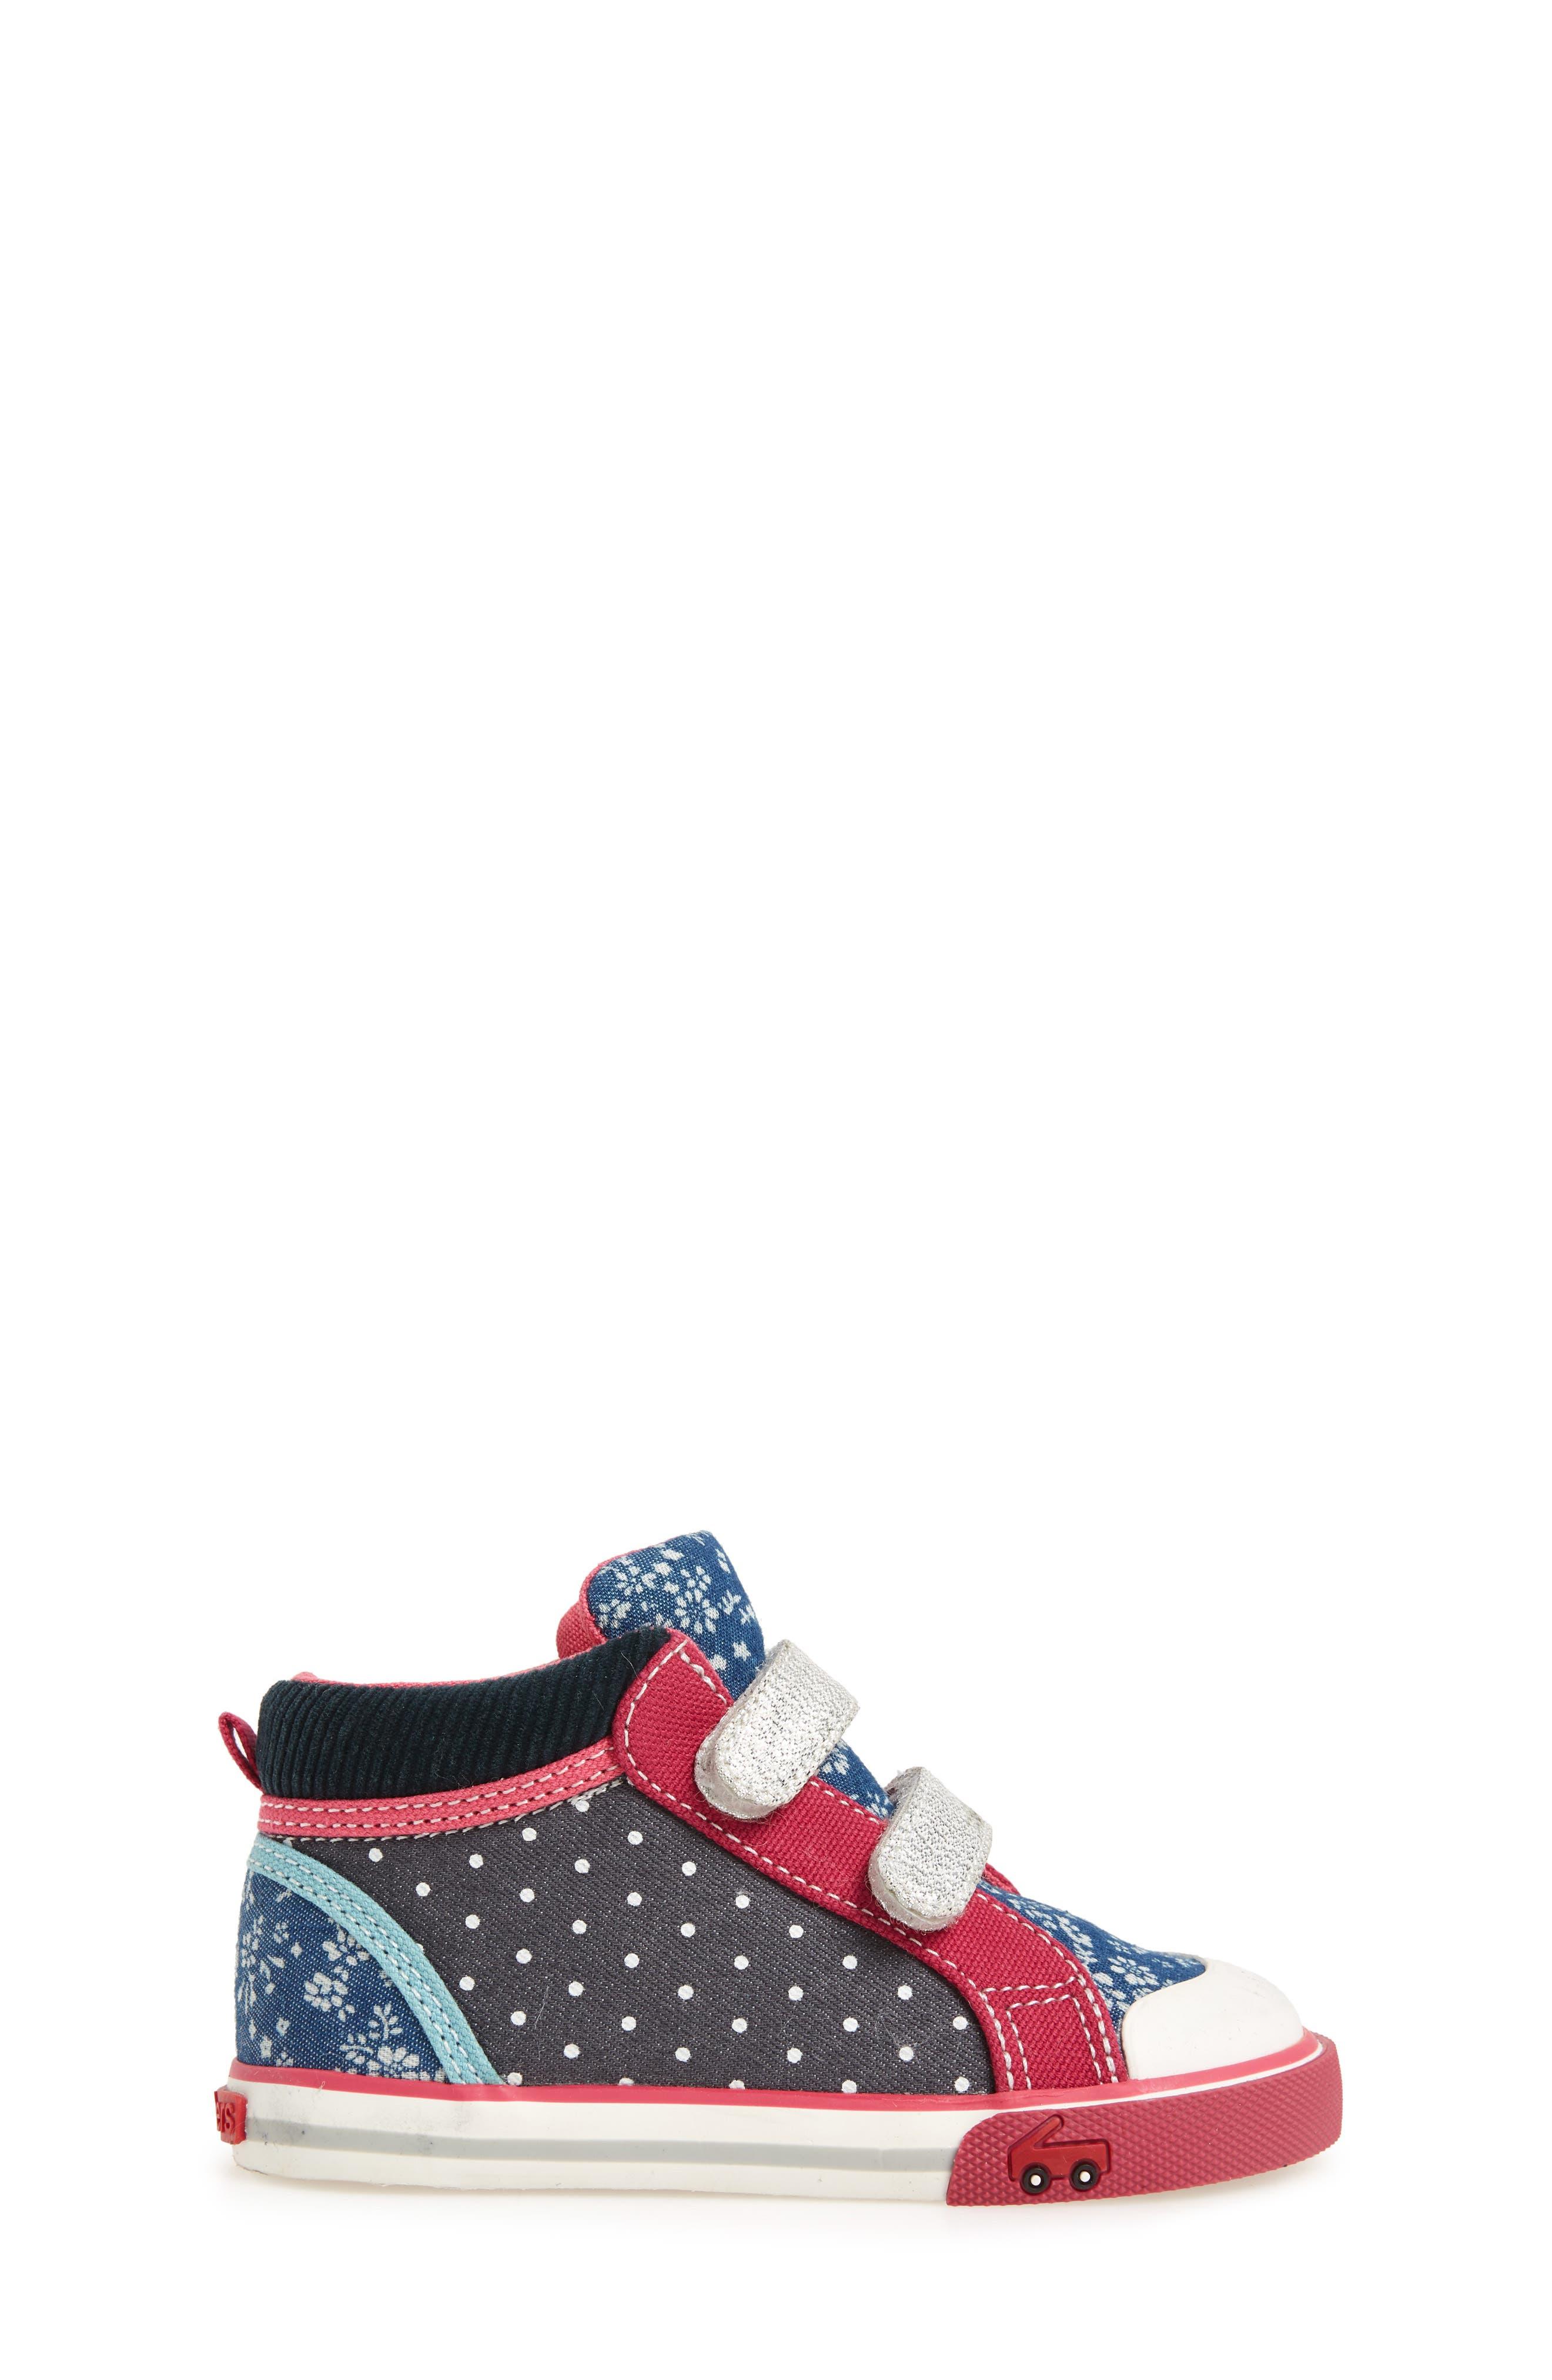 Kya Sneaker,                             Alternate thumbnail 3, color,                             Navy Corduroy/ Multi